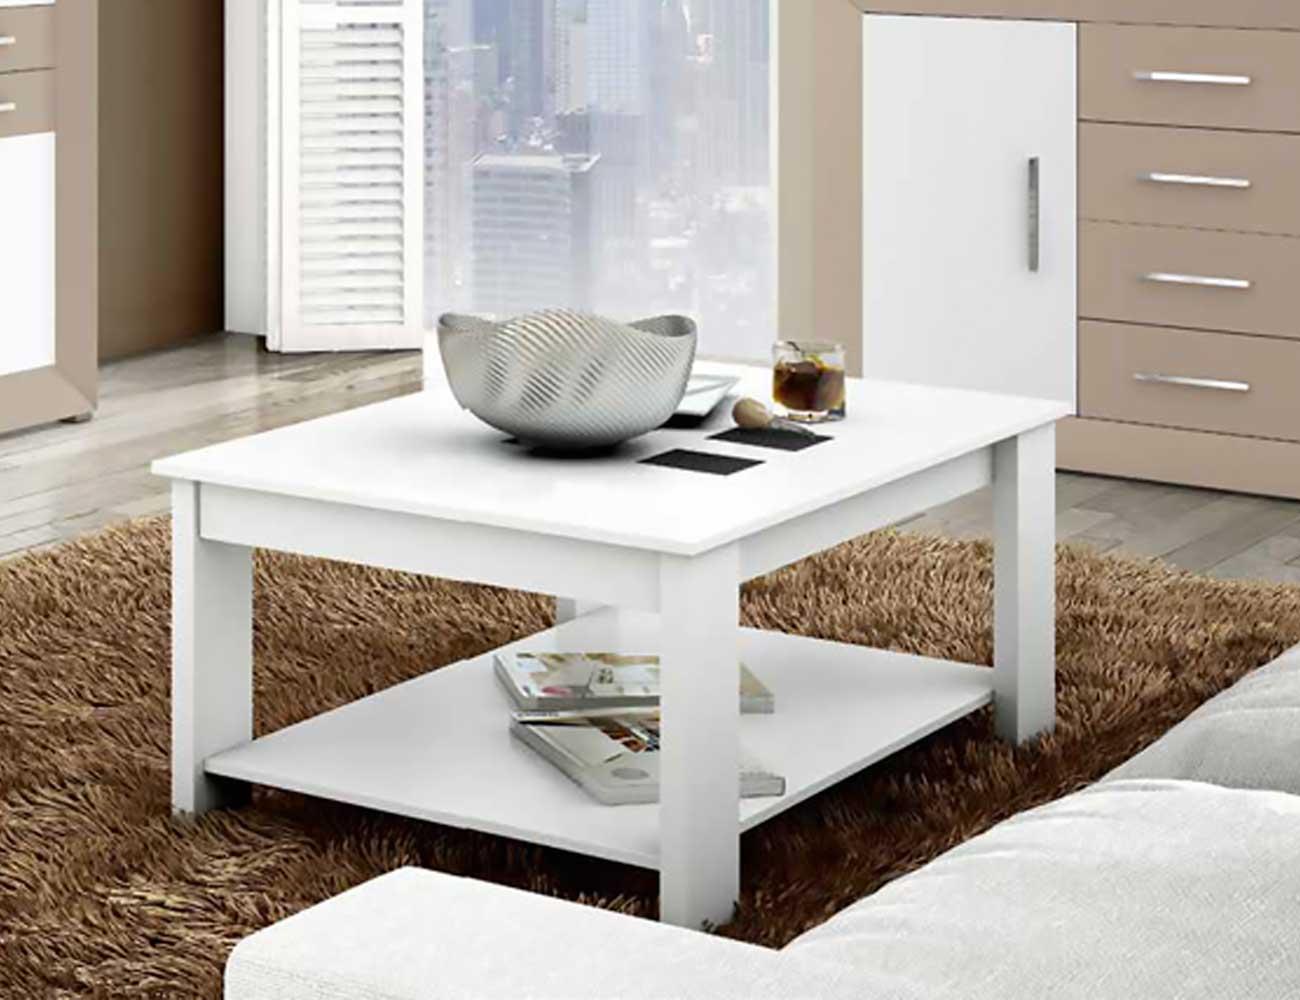 Mueble de sal n moderno blanco con vis n 2428 factory - Salon moderno blanco ...